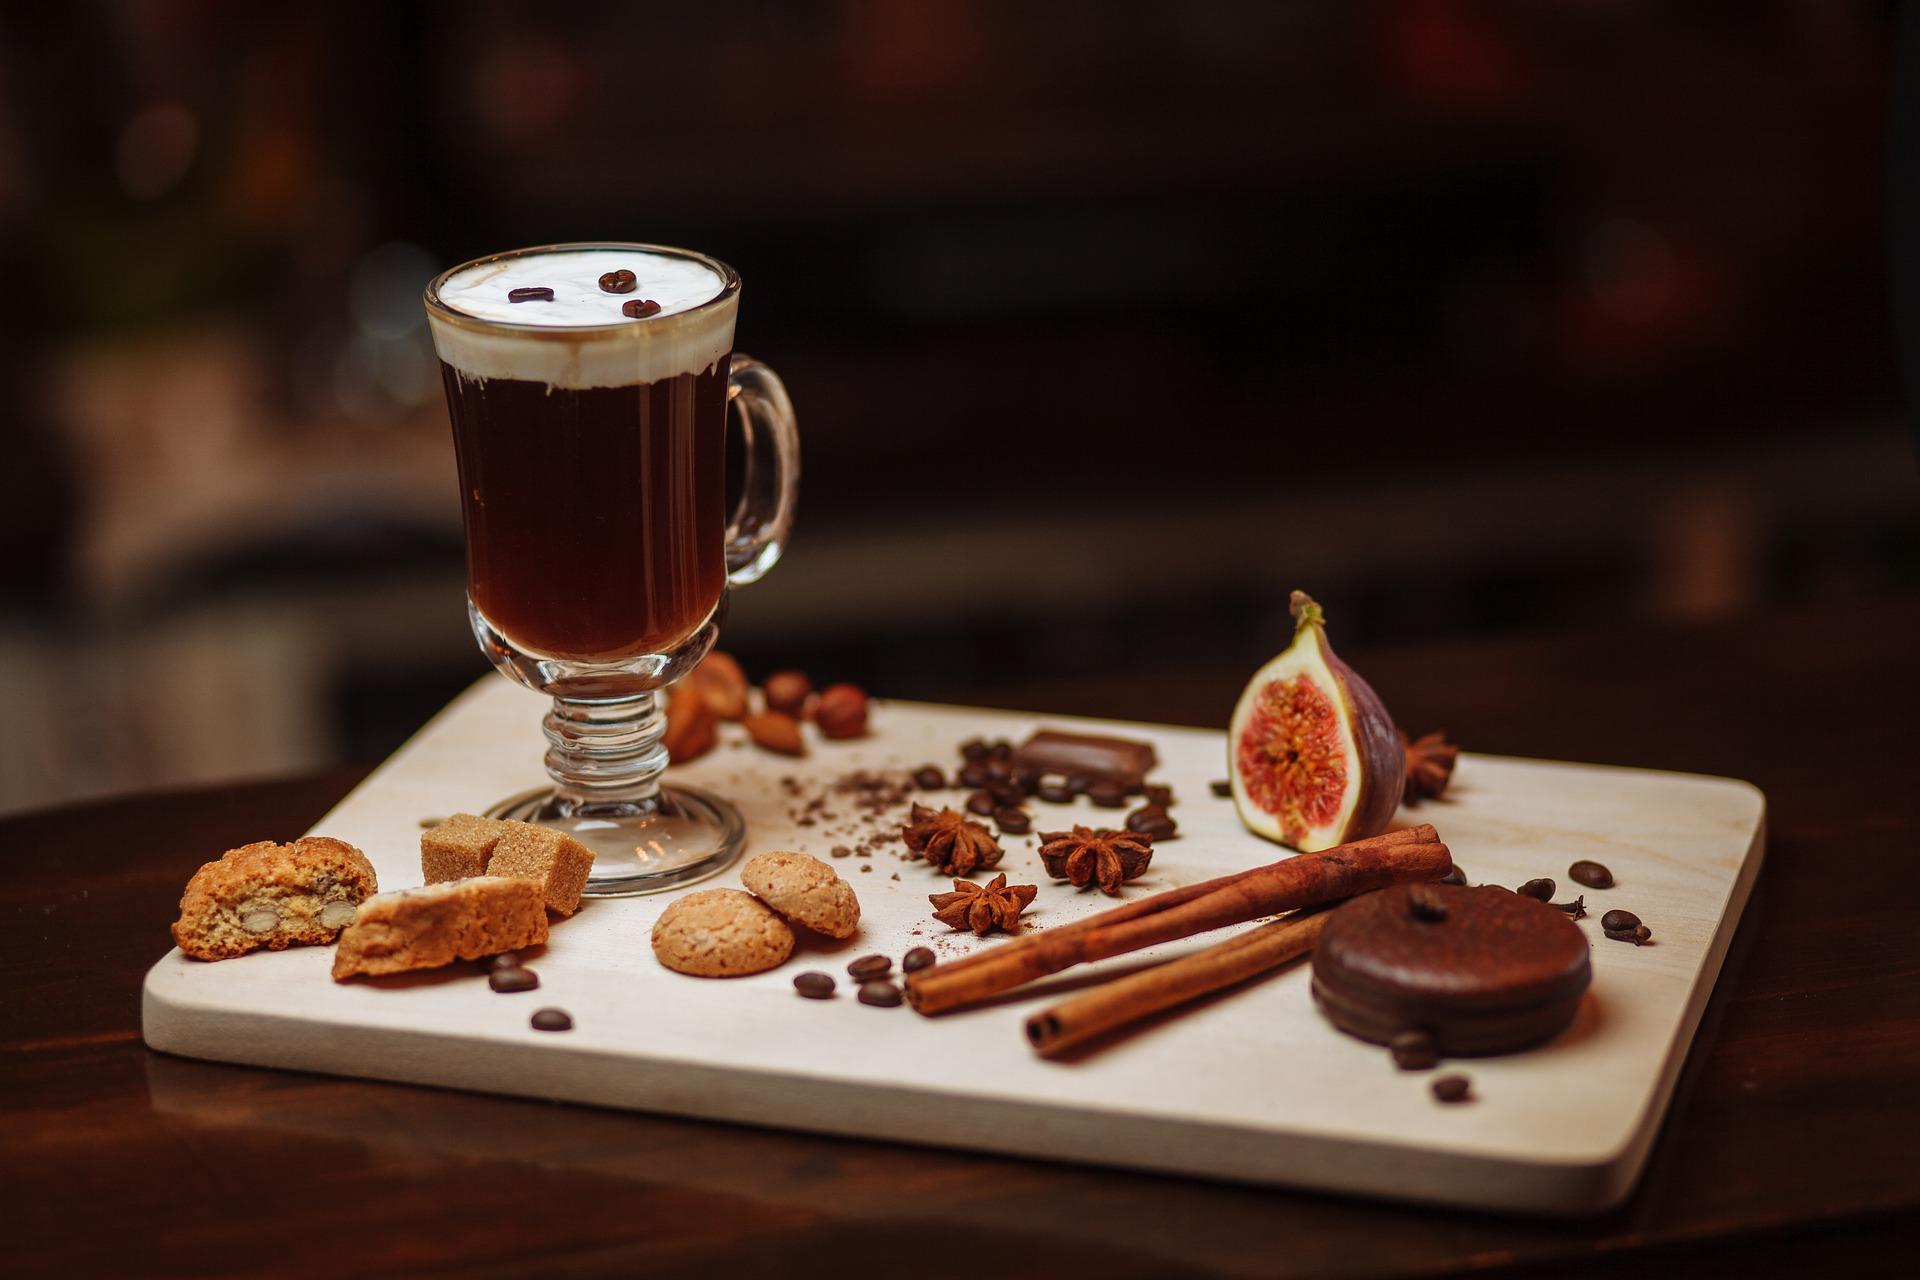 coffee-3120758_1920.jpg